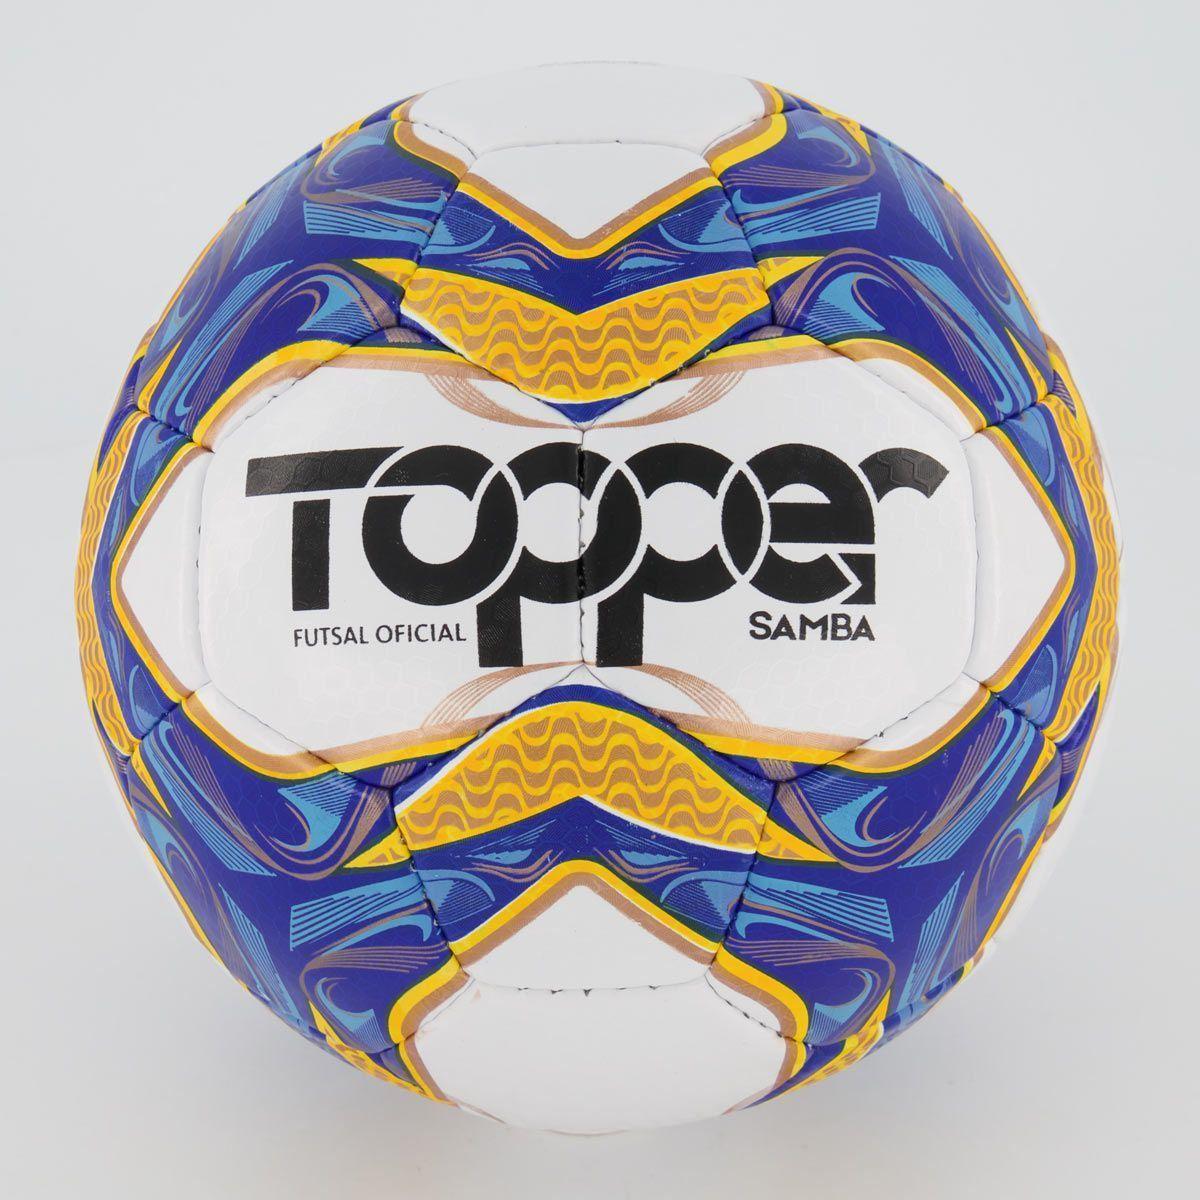 Cupom de desconto Bola Topper Samba II Futsal Branca e Laranja